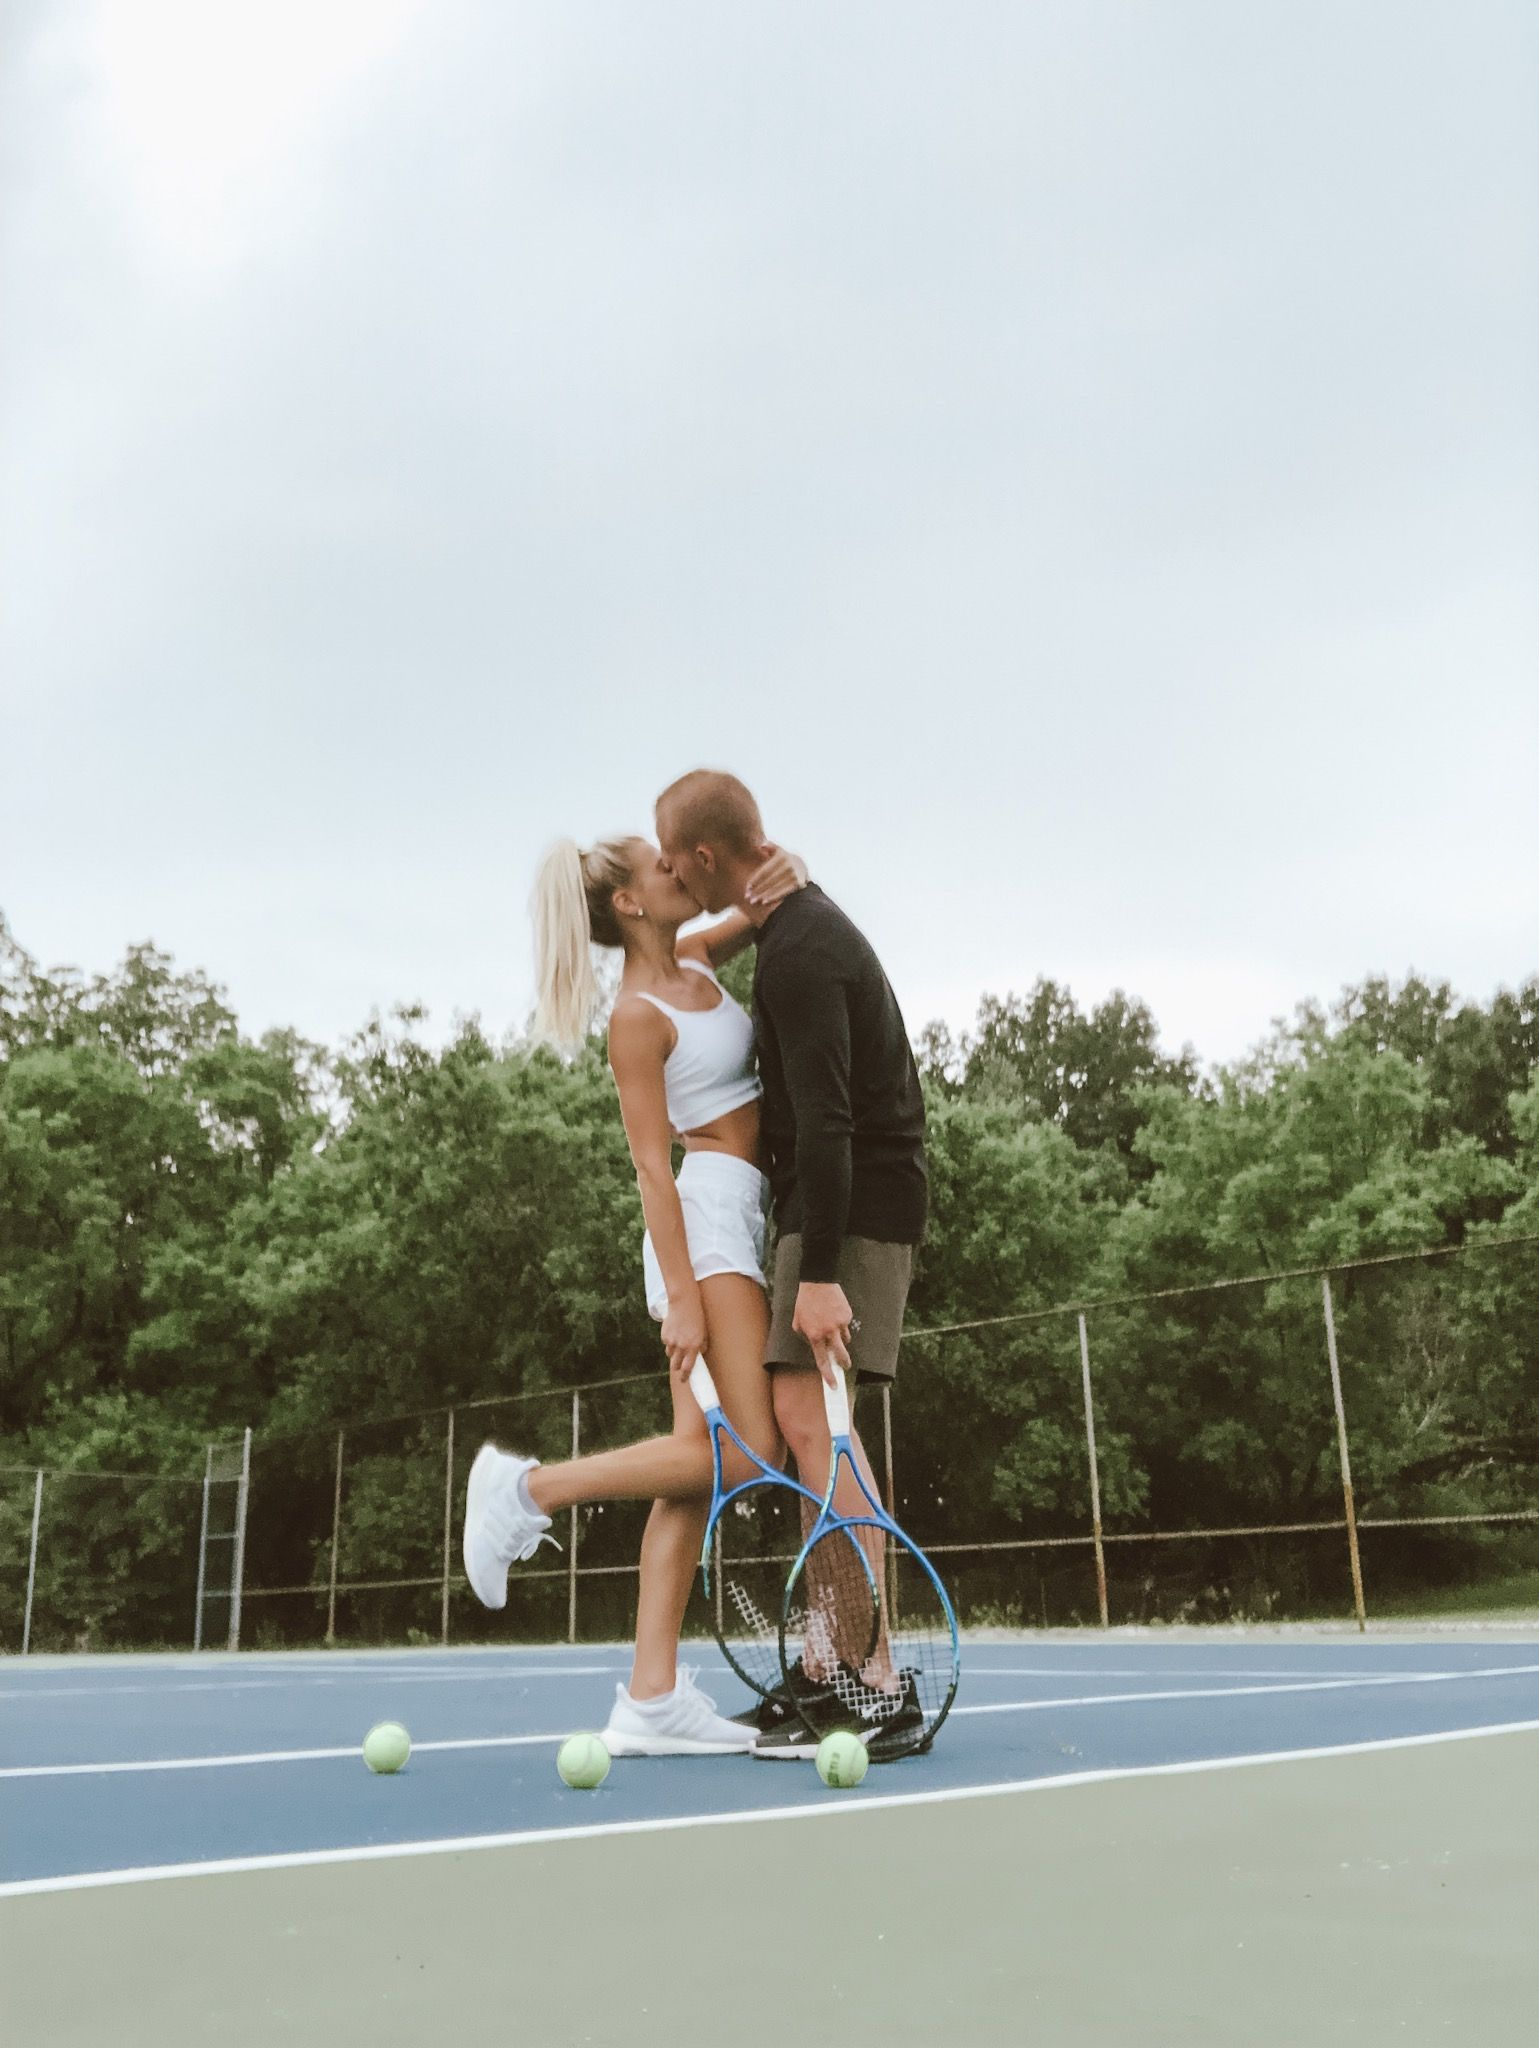 Get The Look Tennis Pro Catherine Bellis Valentino Inspired Look Tennis Hair Tennis Outfit Women Tennis Hairstyles